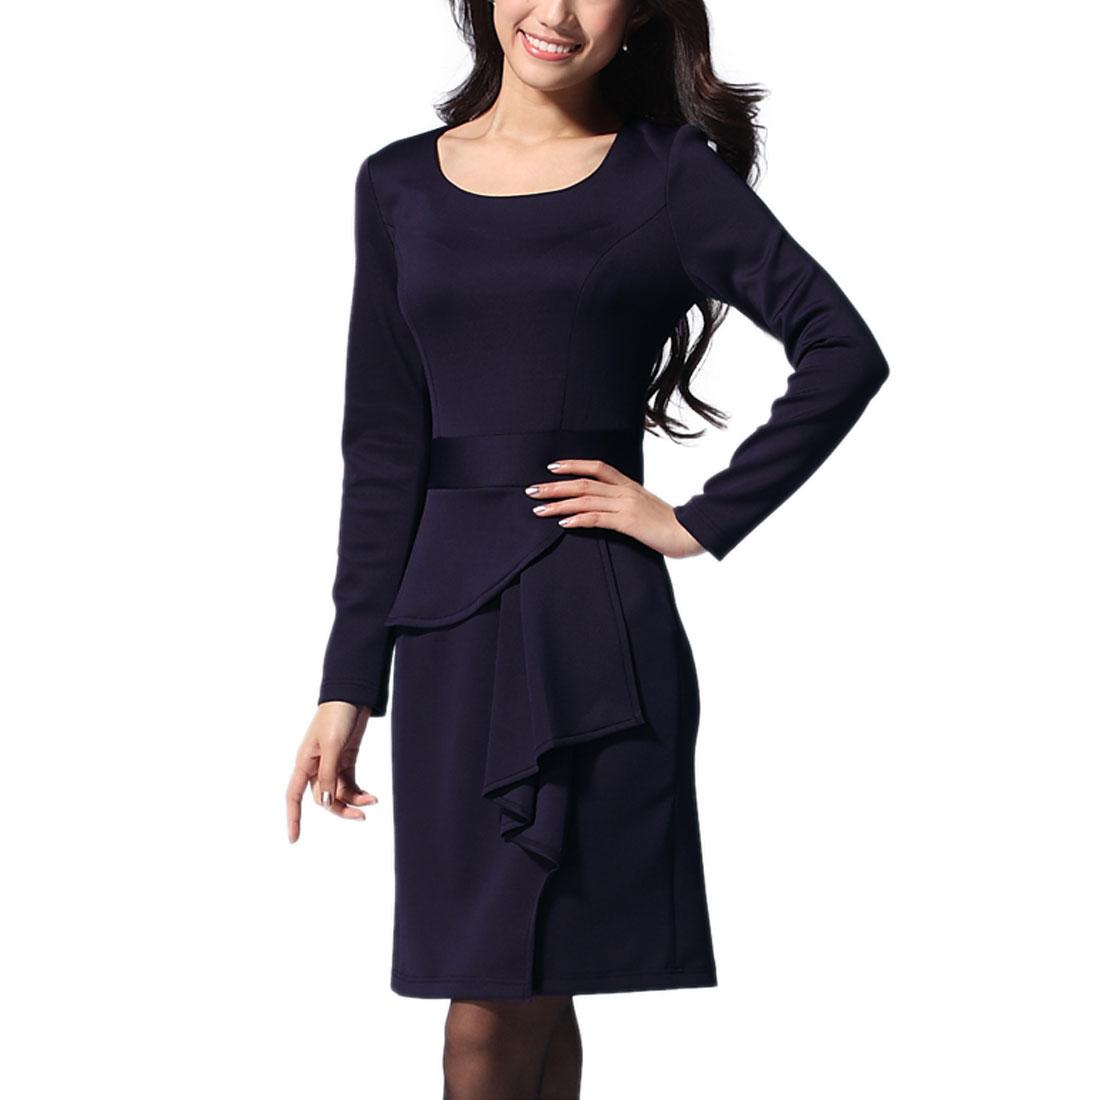 Women Long Sleeves Round Neck Ruffle Decor Dress Purple S